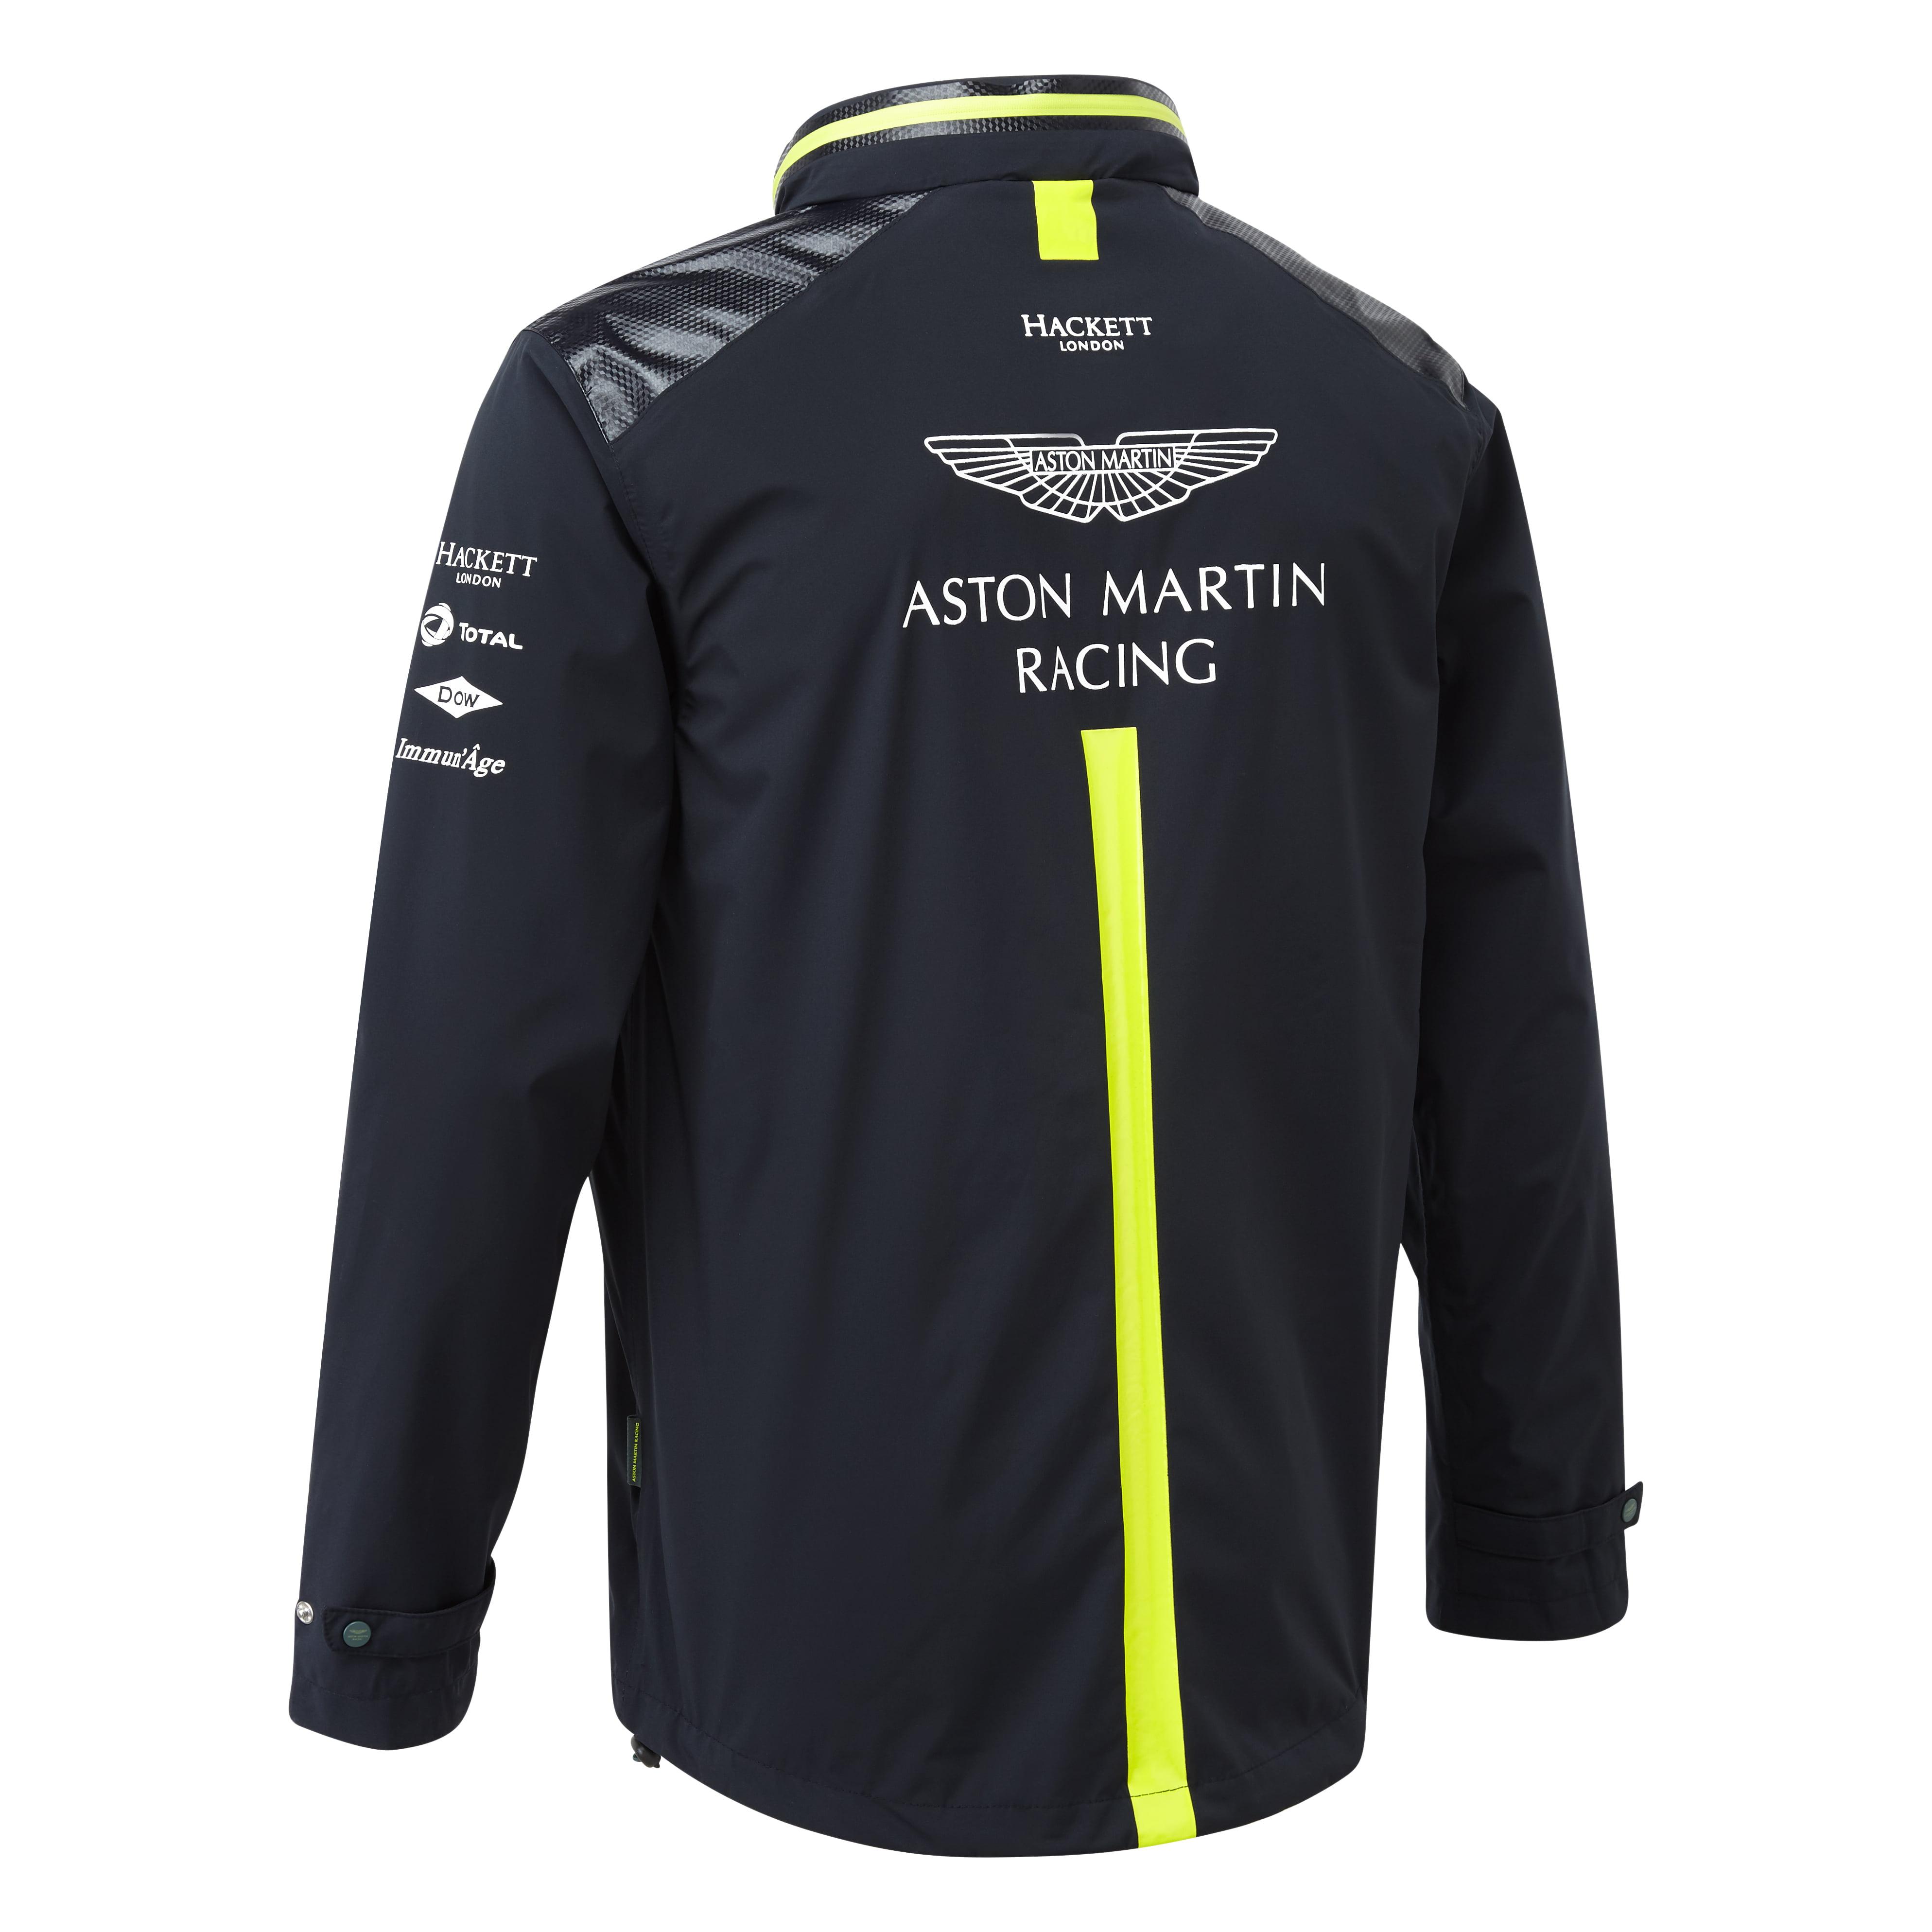 Aston Martin Racing Men S Team Jacket Walmart Com Walmart Com